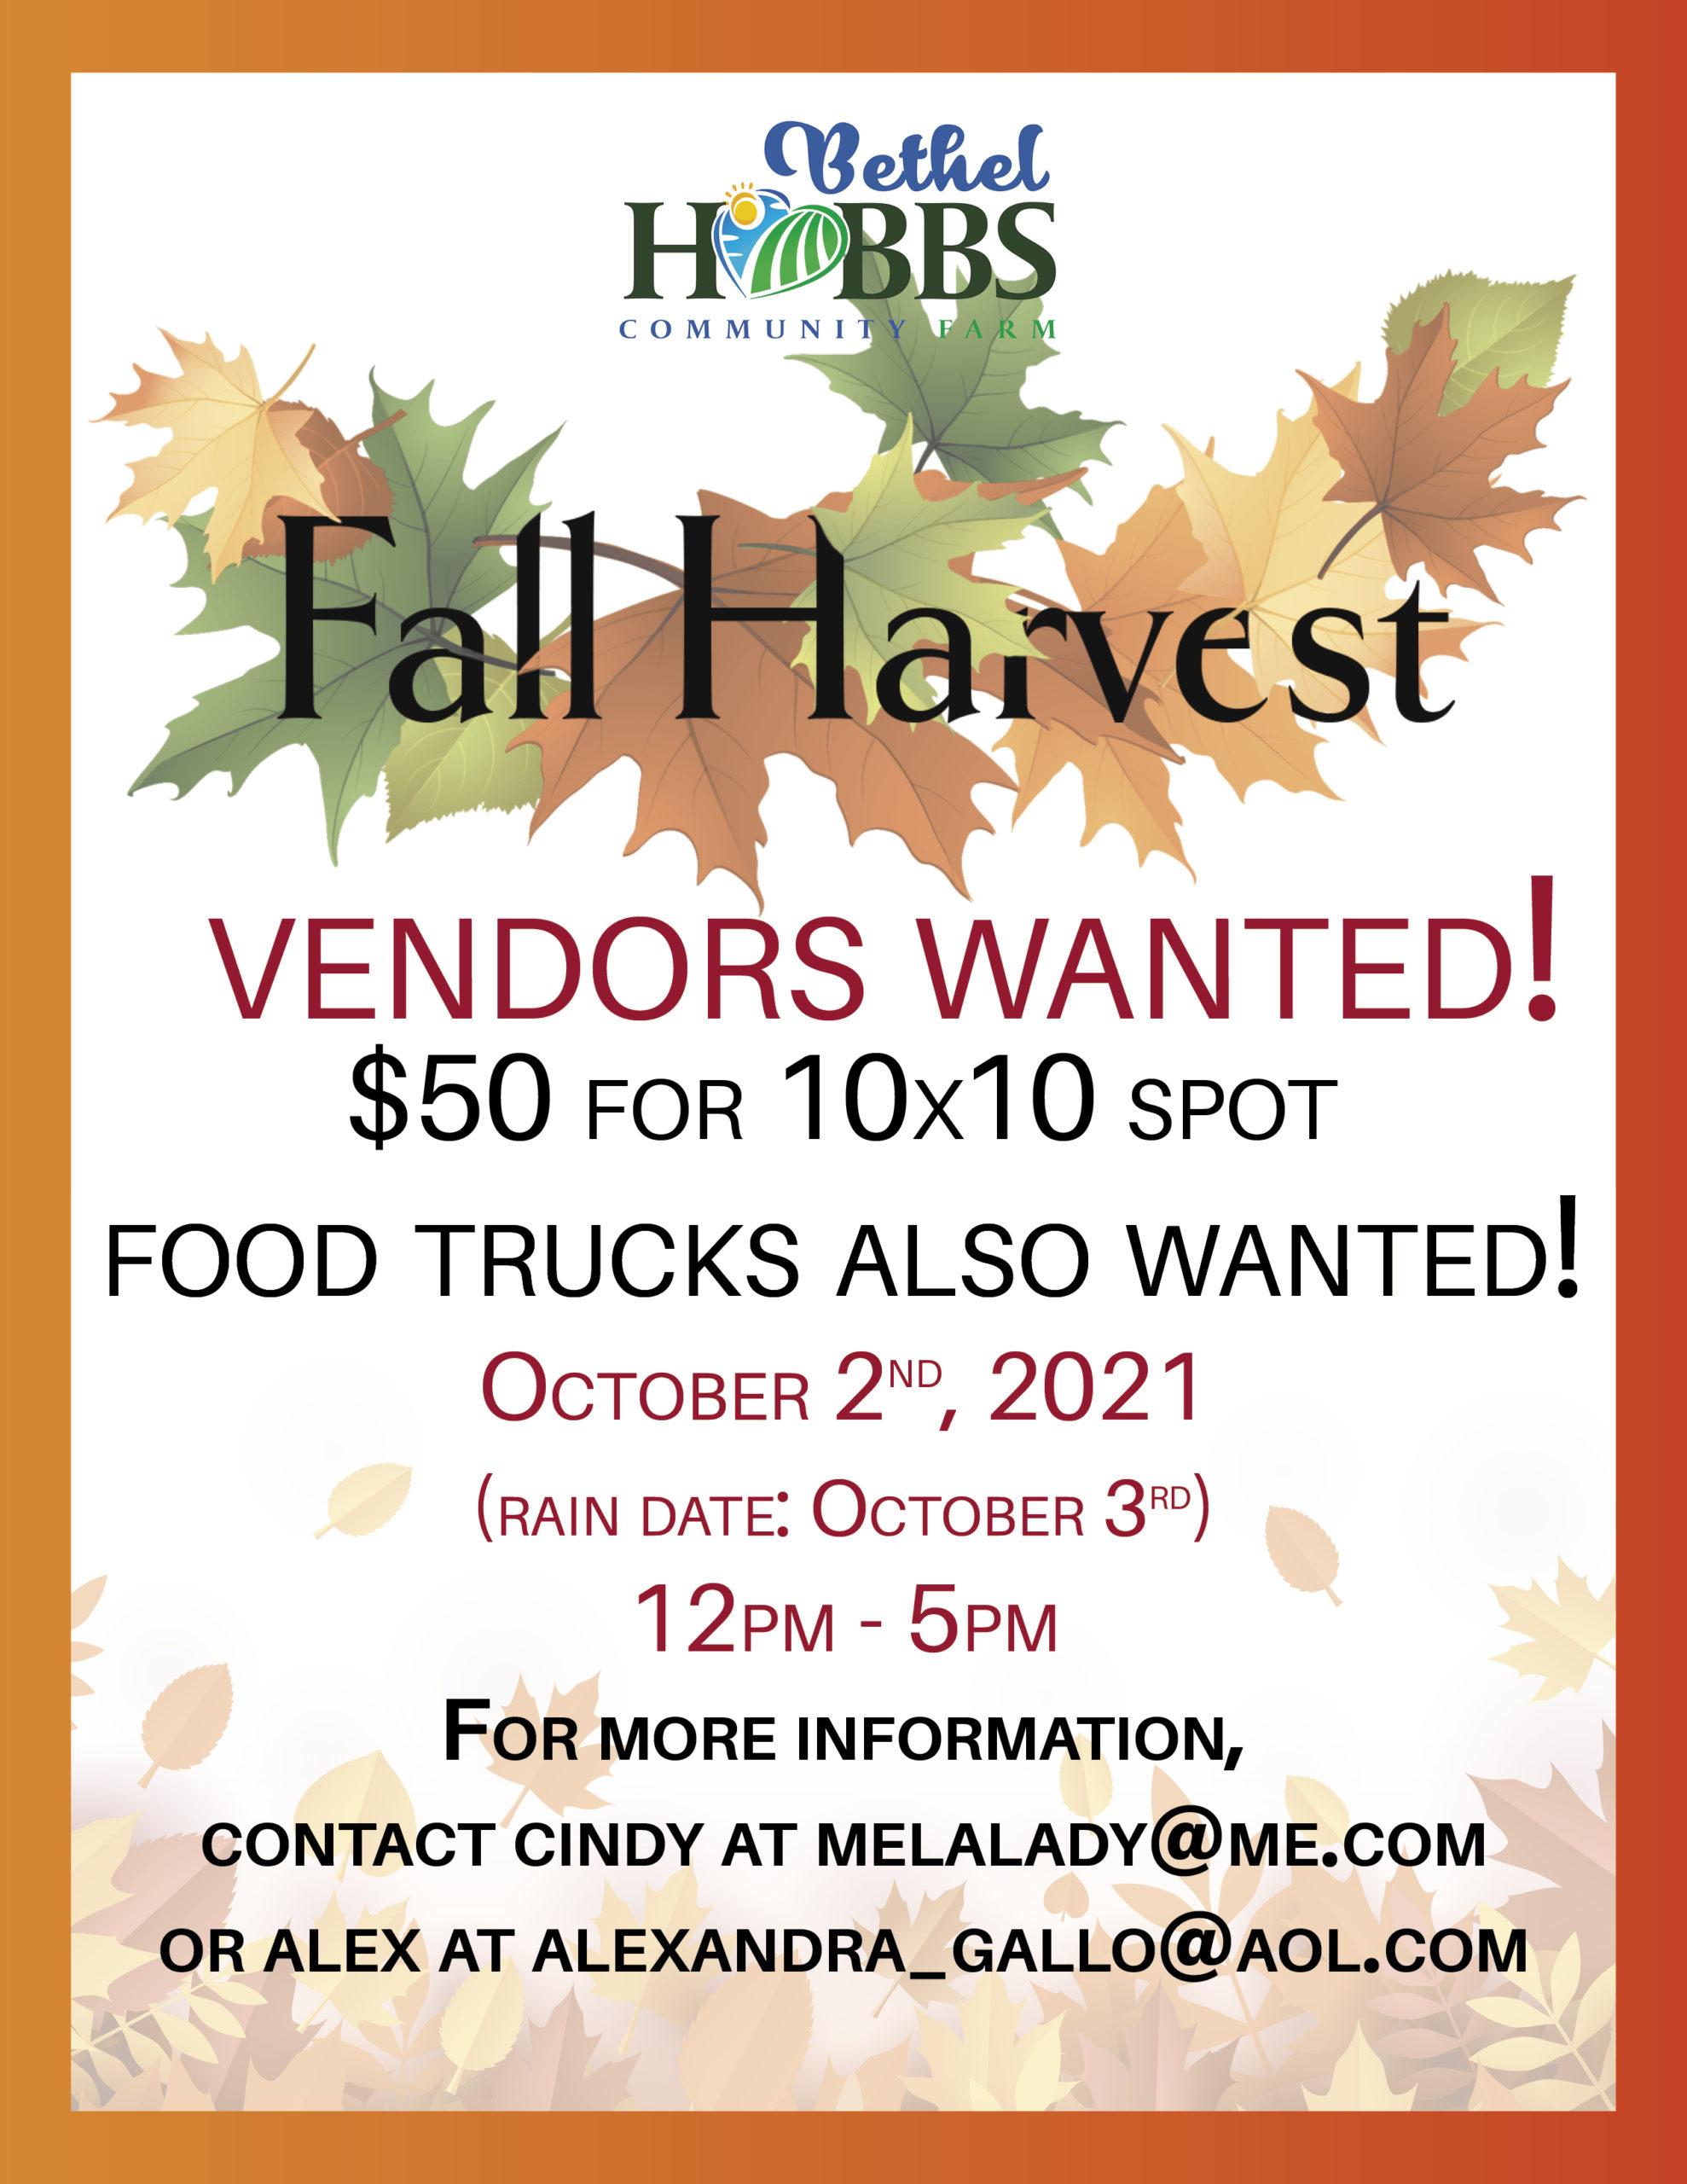 Fall Harvest Festival at Bethel Hobbs Farm